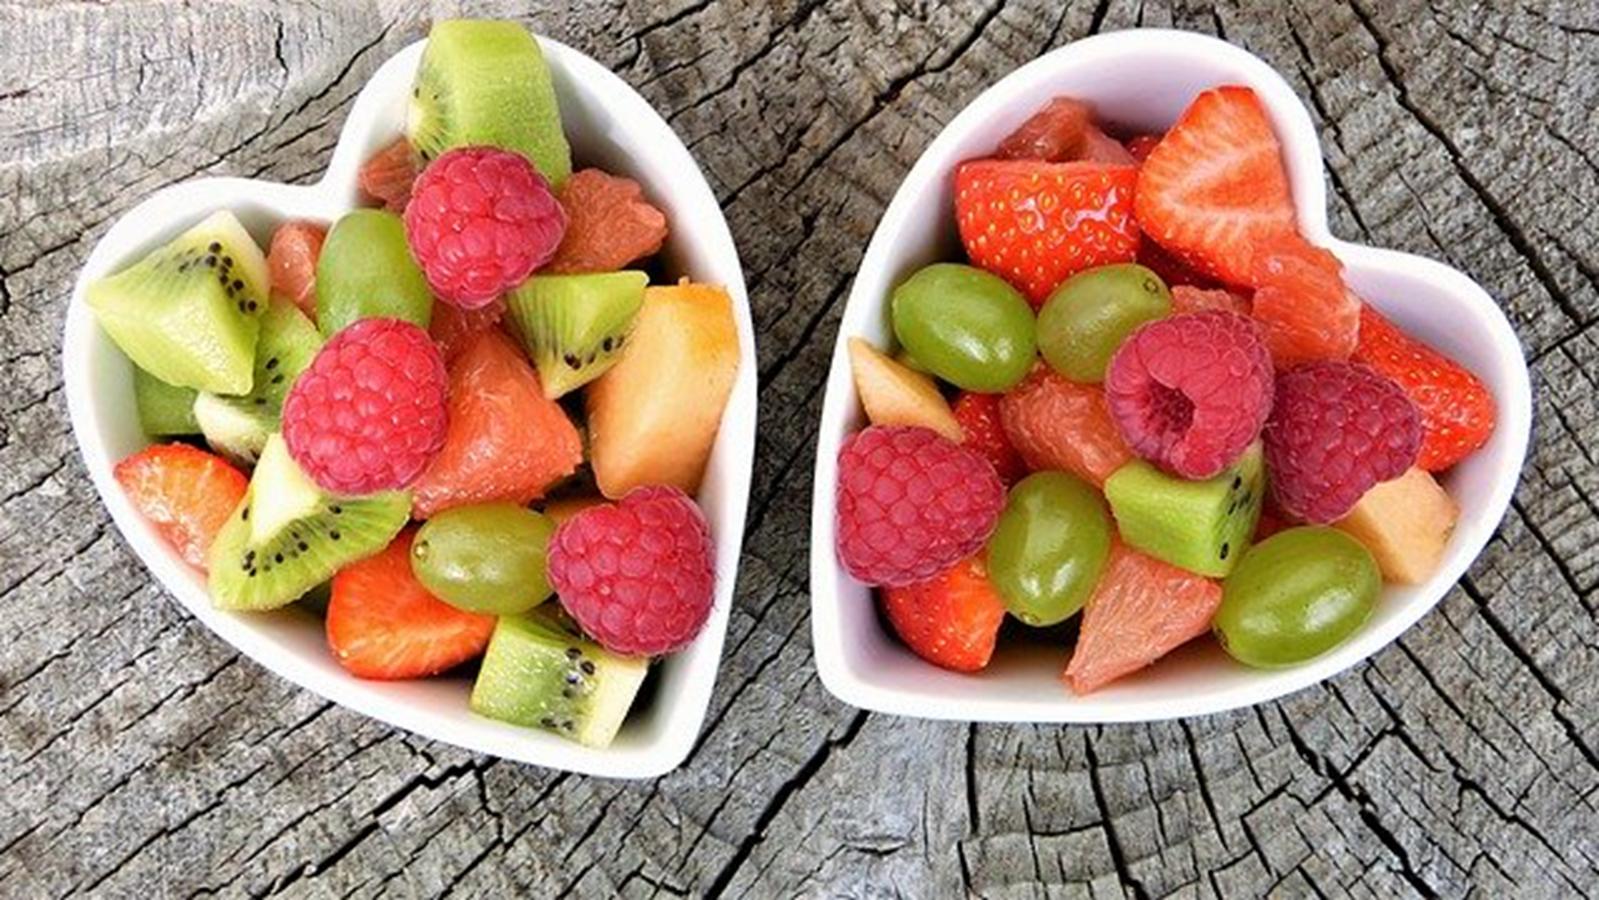 水果沙拉(图:pixabay/silviarita)